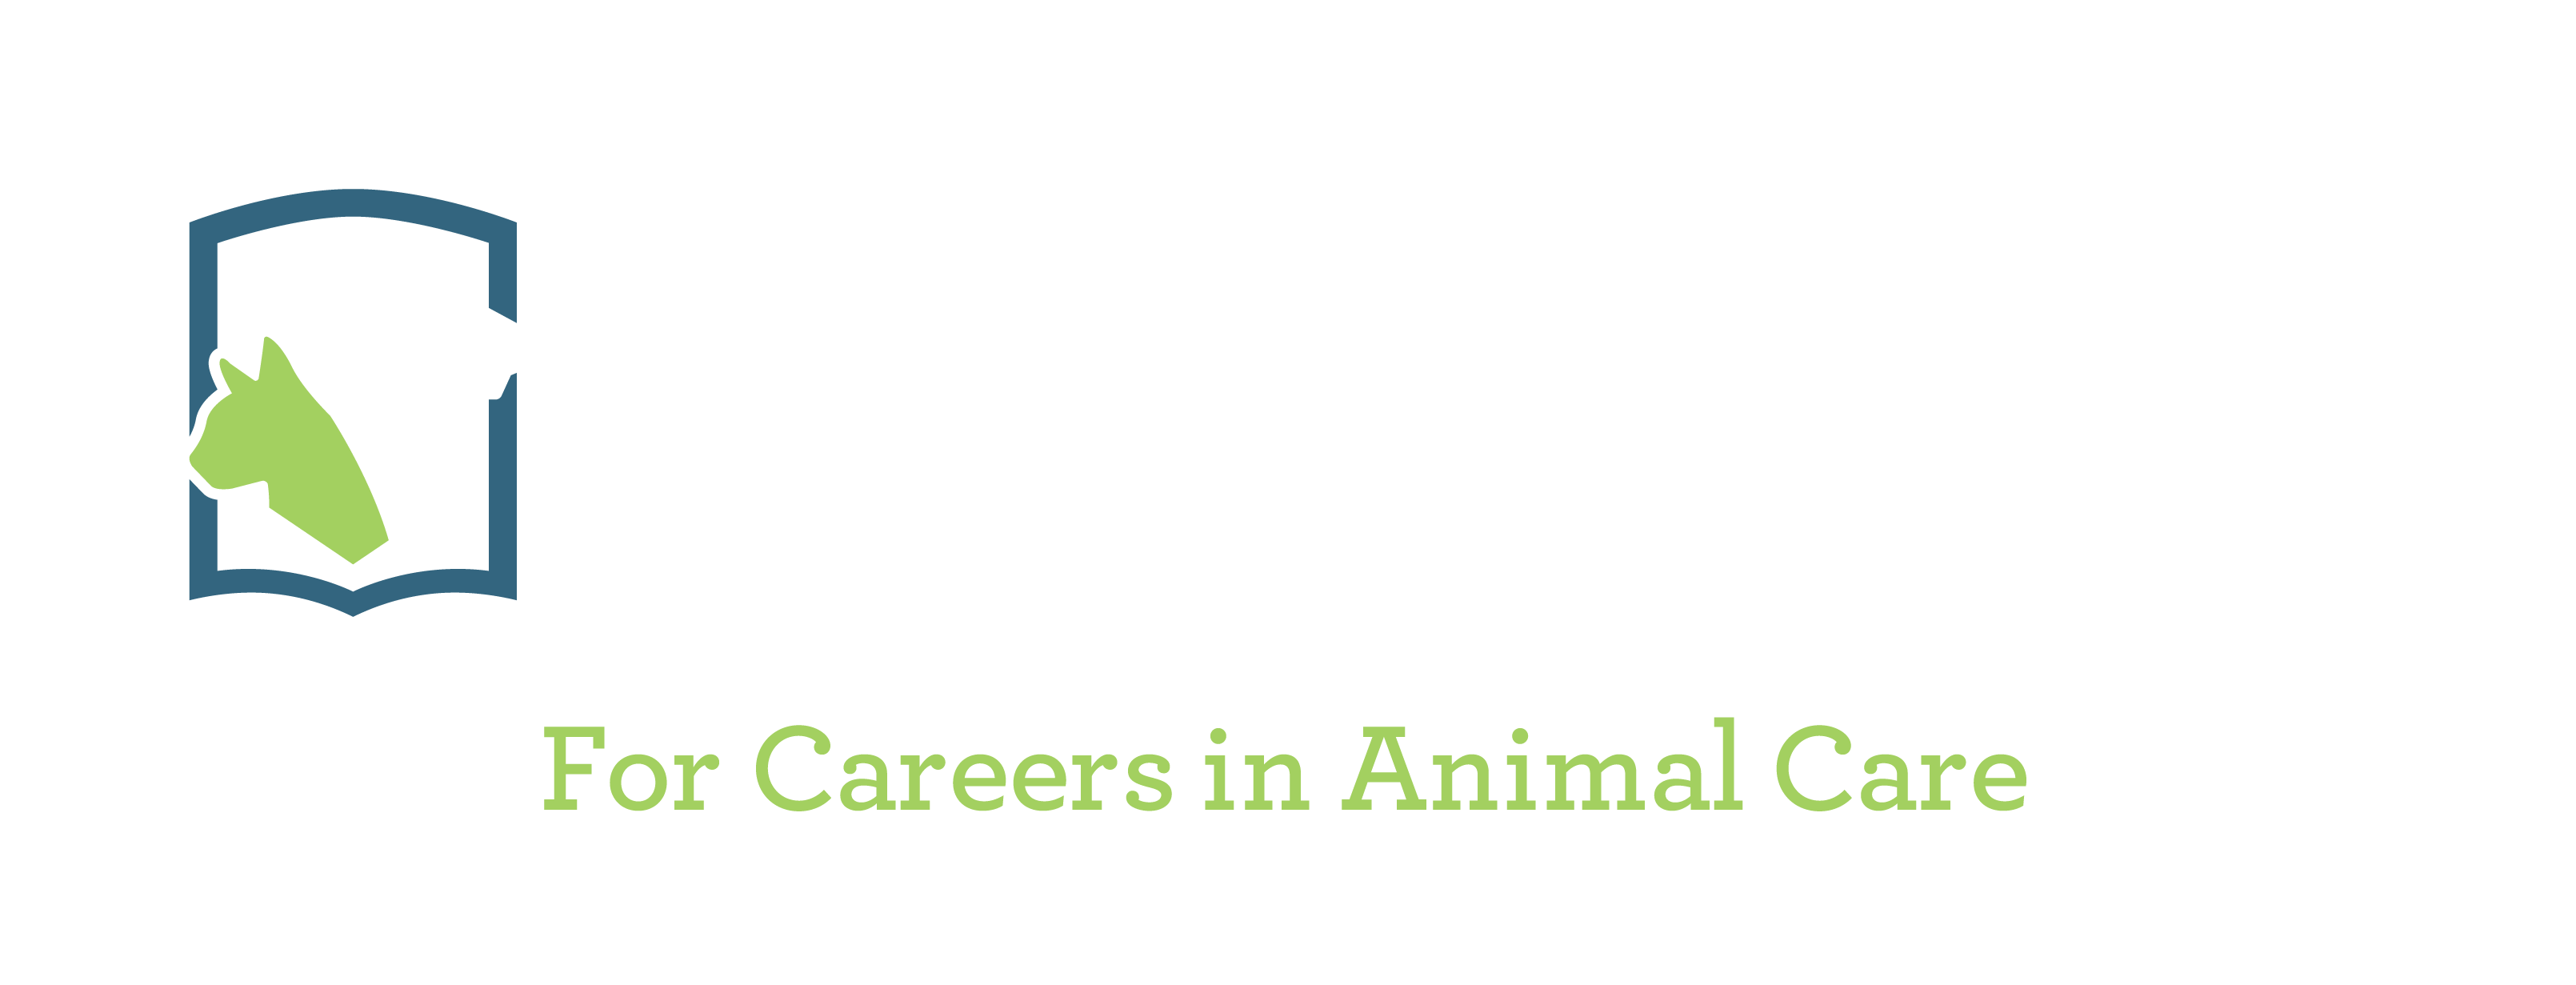 Job Vacancies Working In Animal Care And Veterinary Nursing